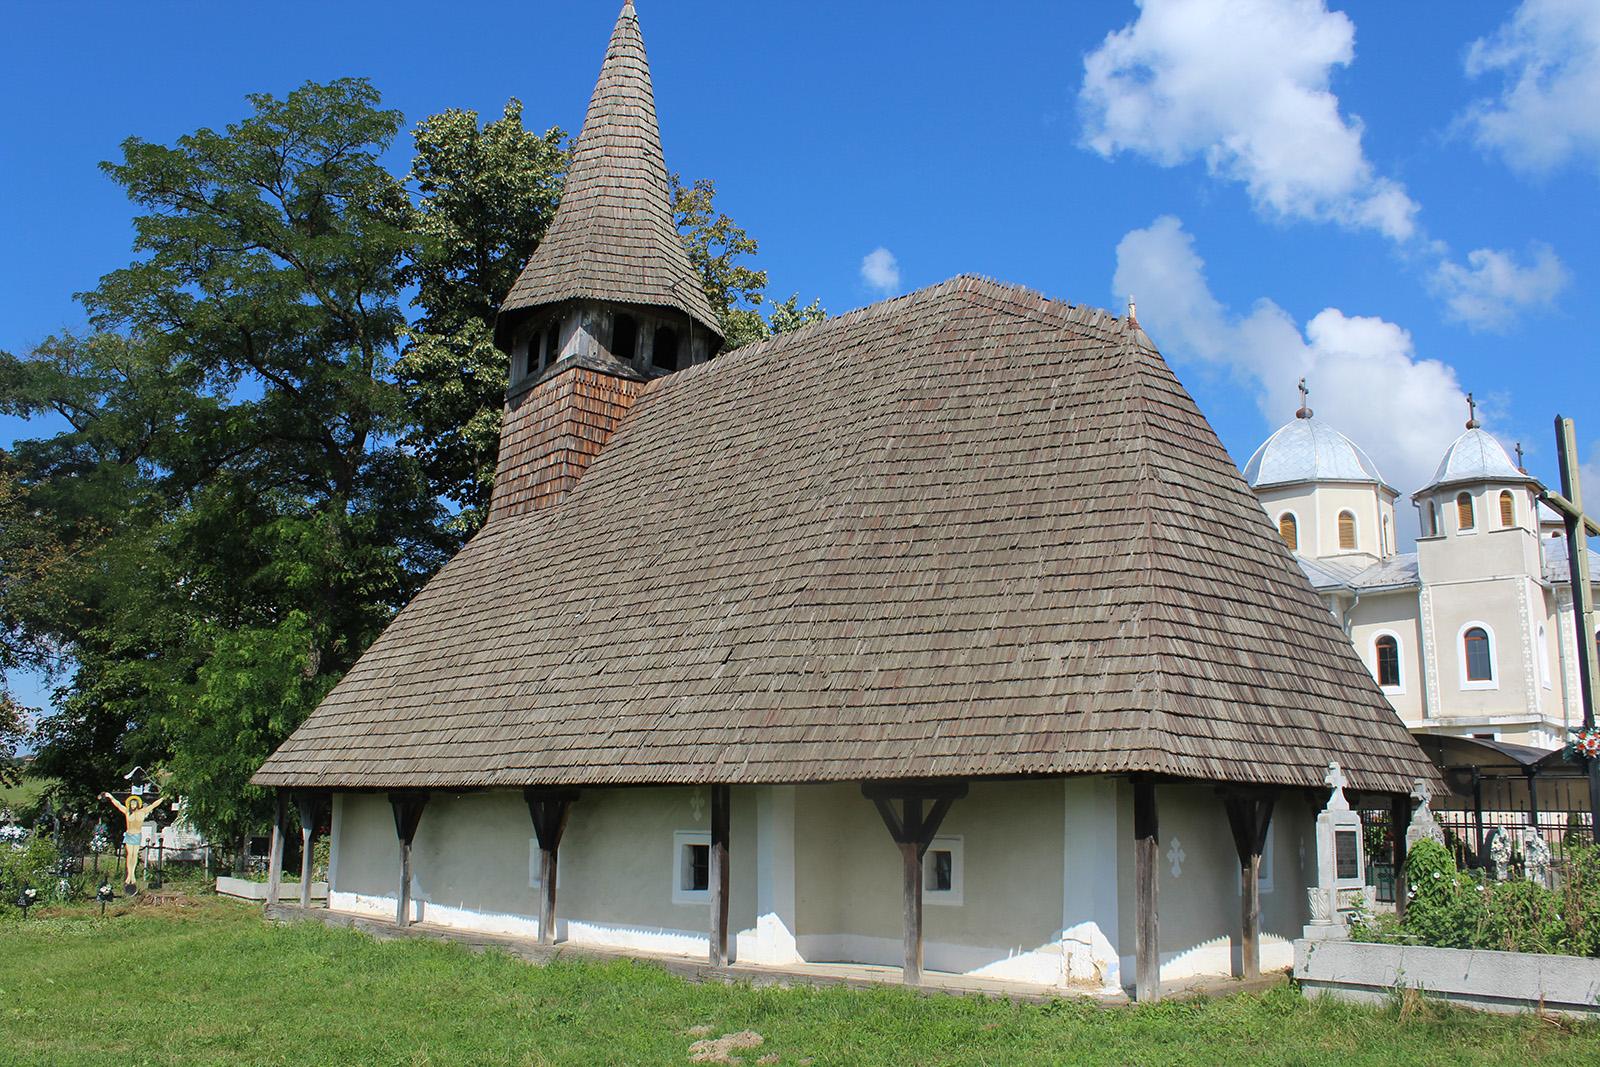 2. Biserica de lemn din VOErciorog